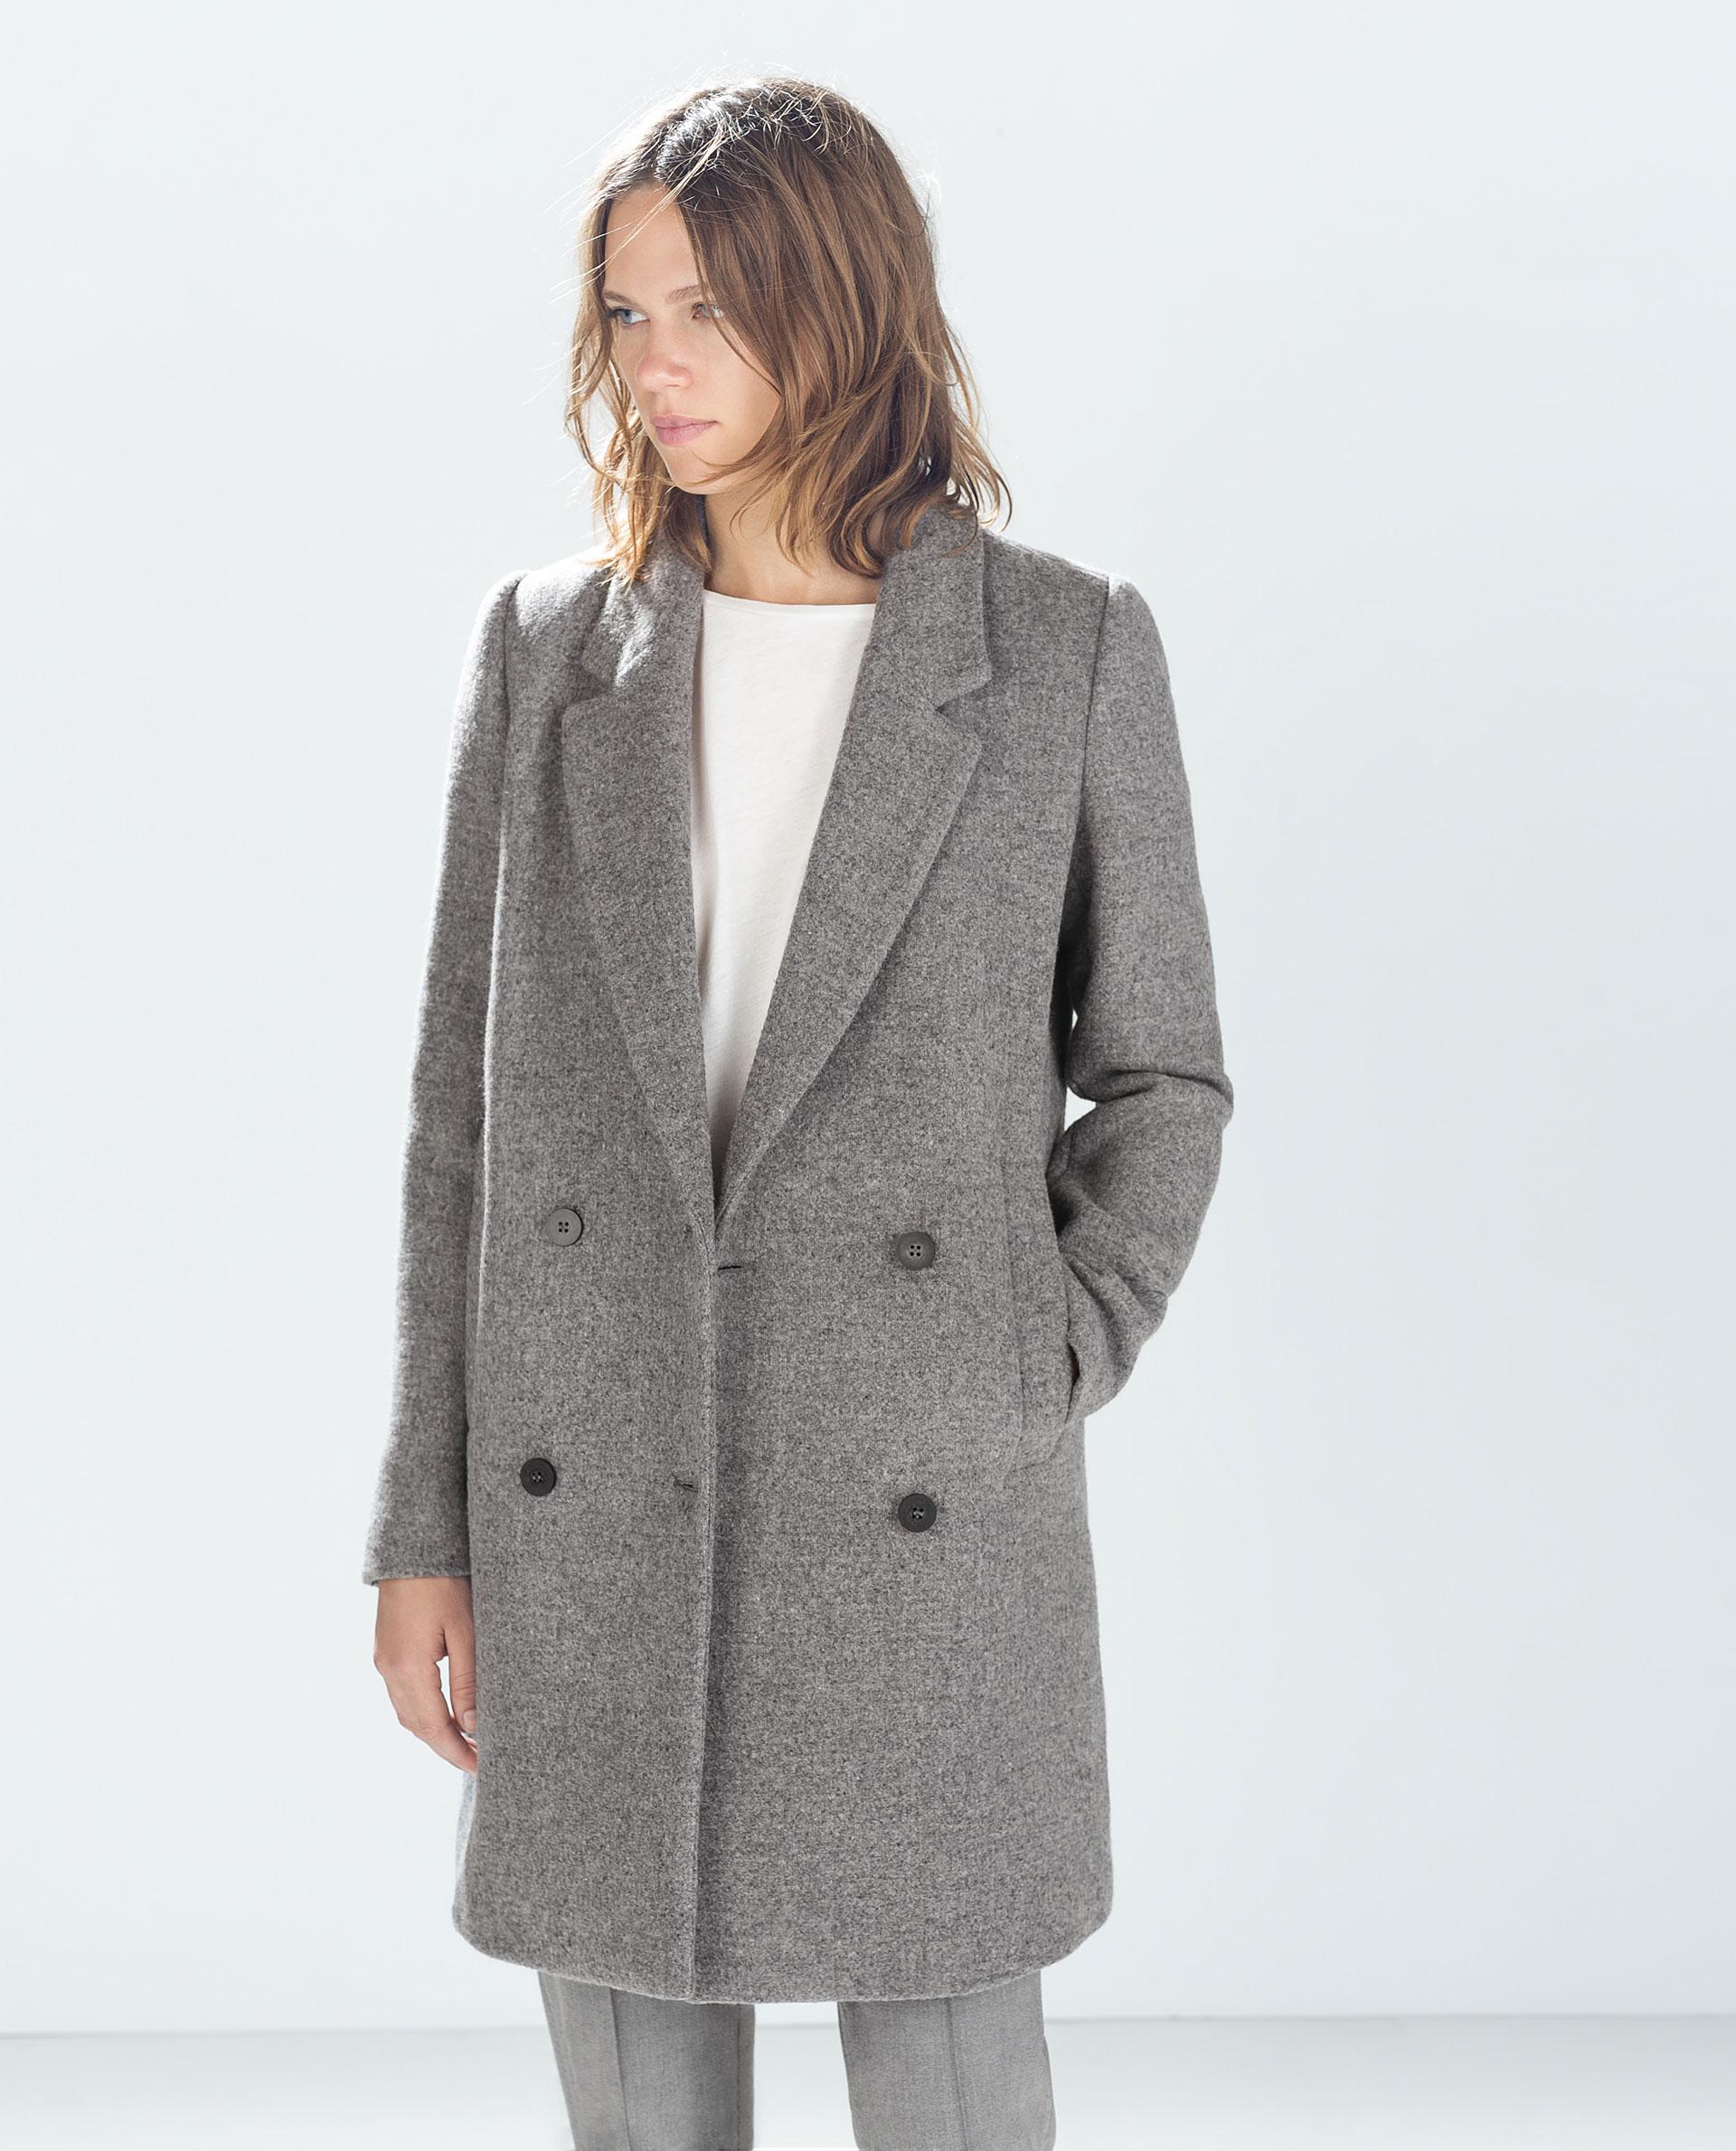 Zara Structured Coat In Gray Lyst